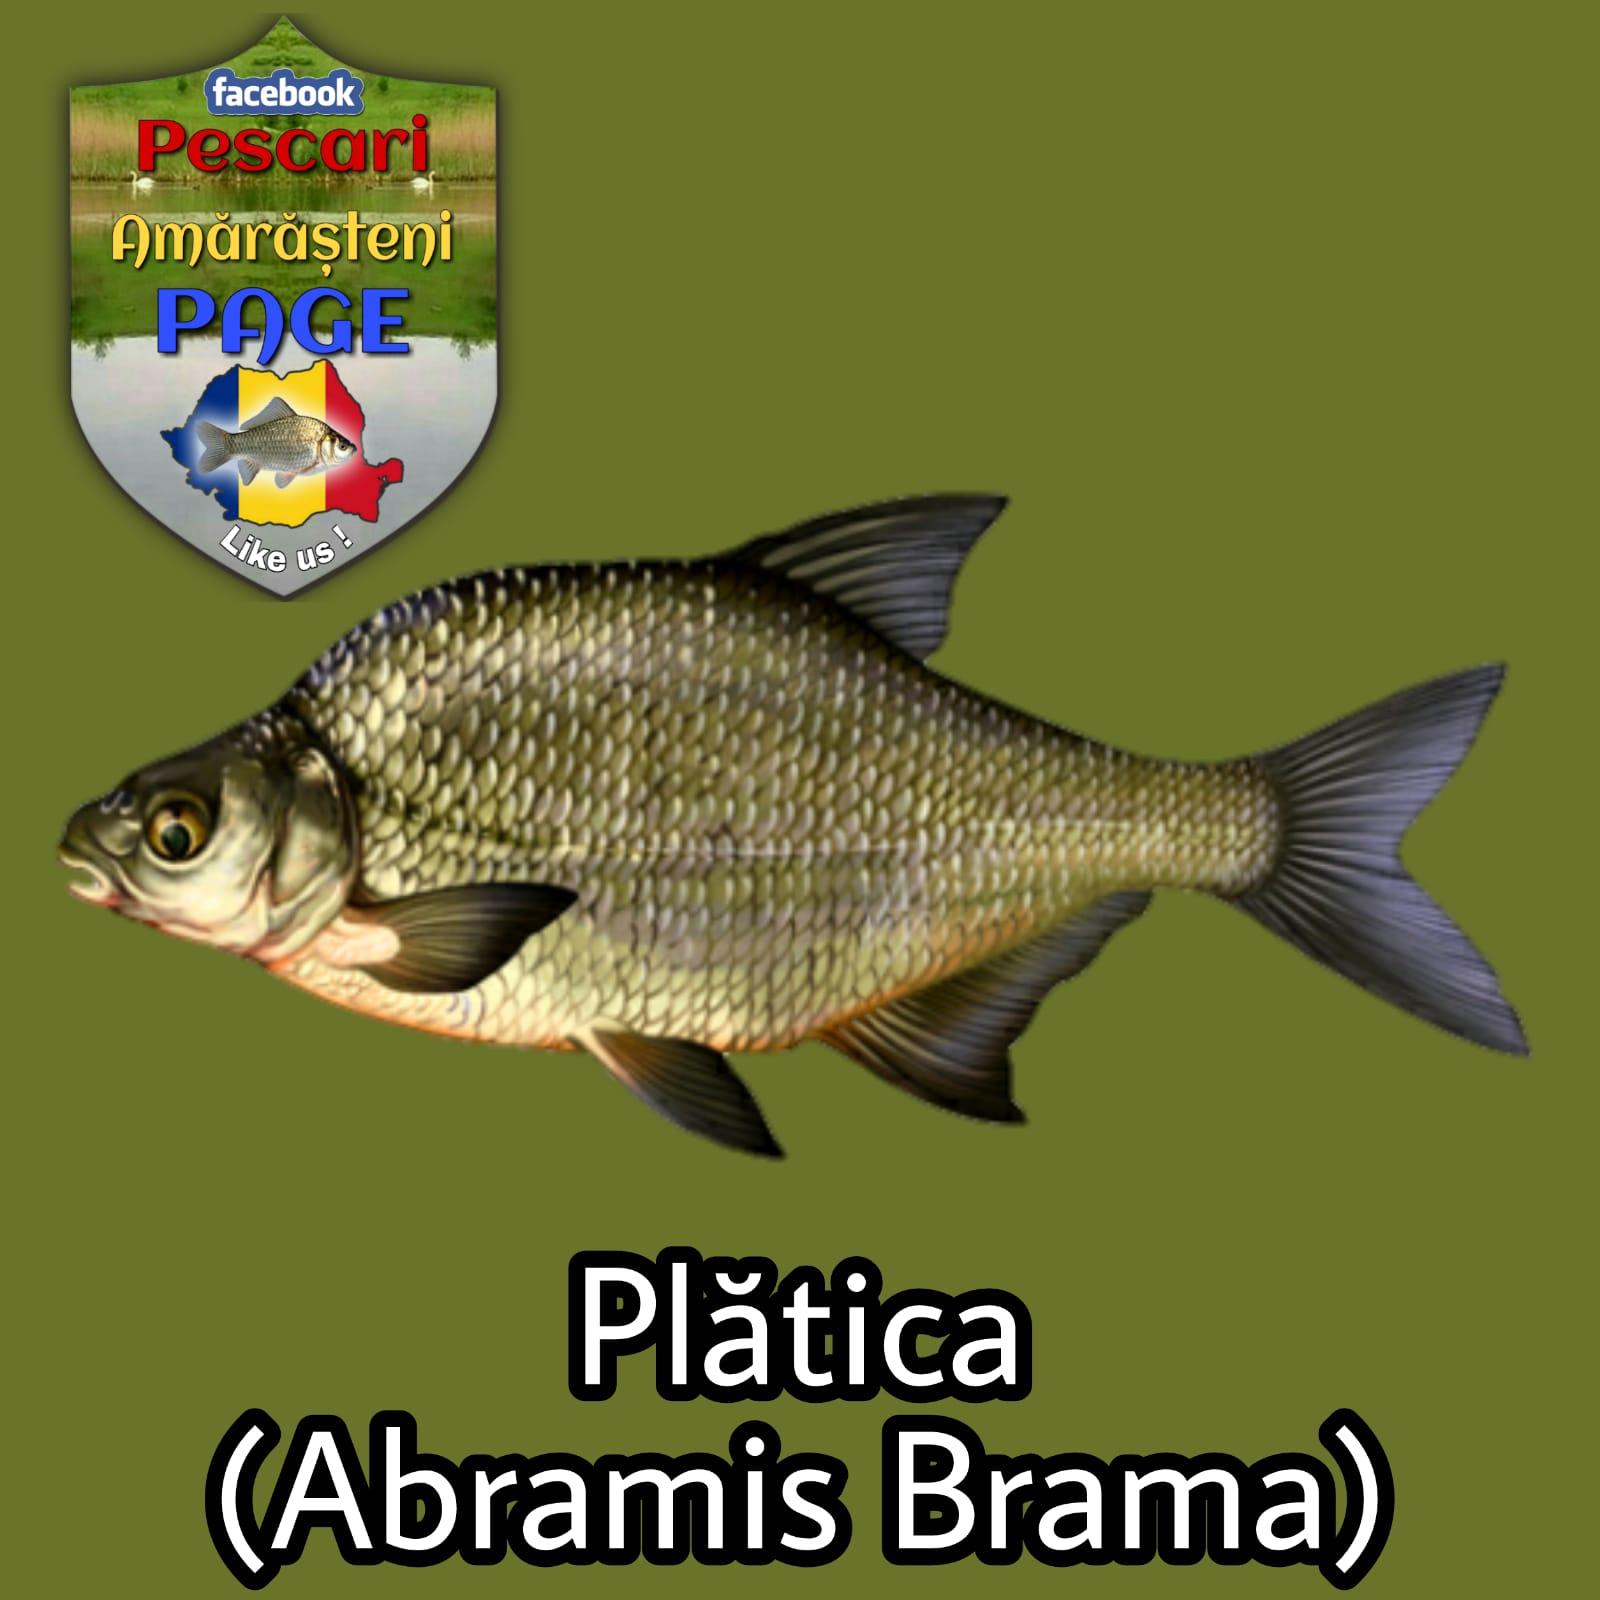 Plătica (Abramis brama)